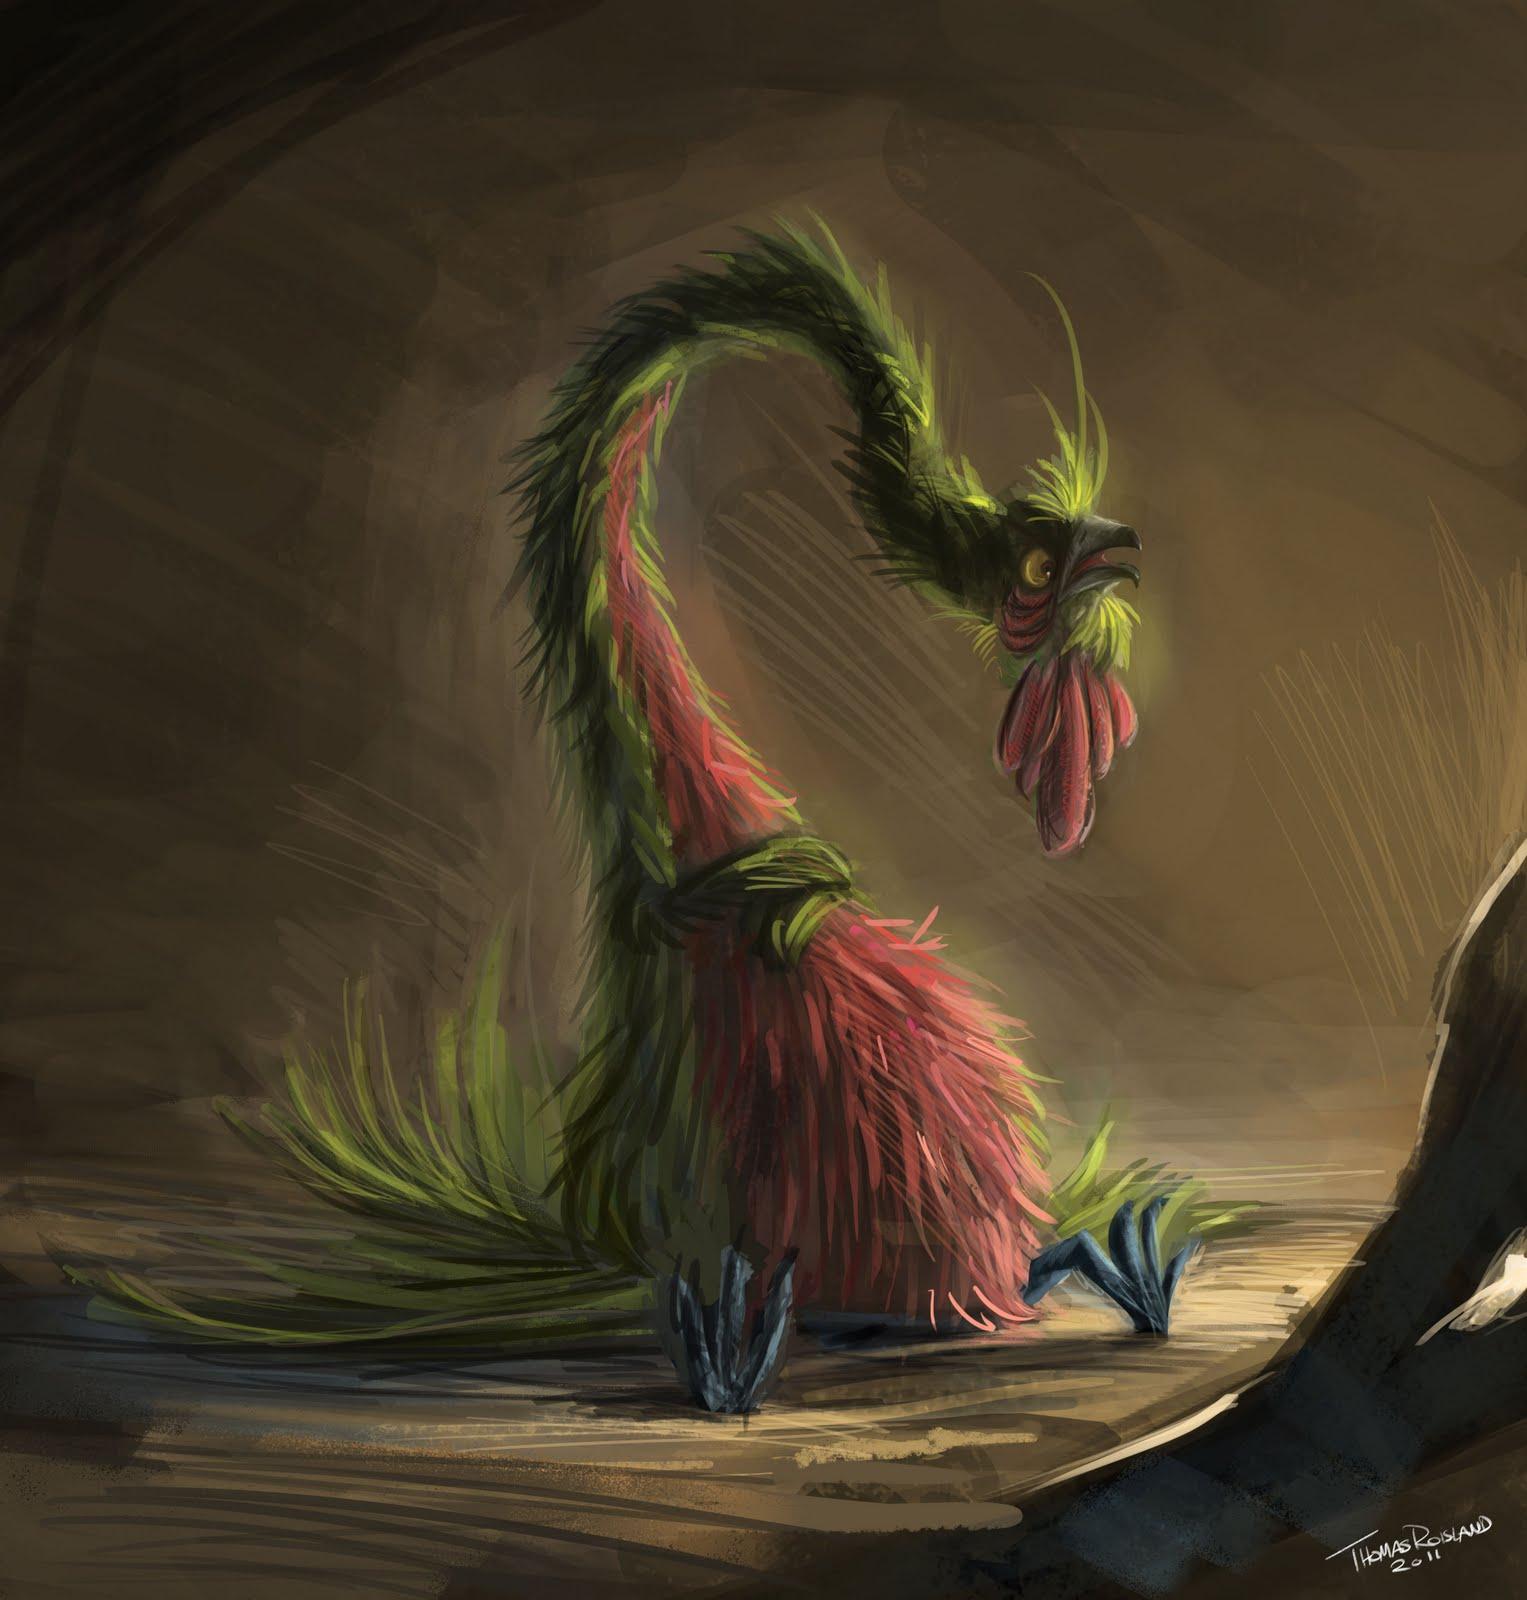 Thomas Roisland: Fantasy bird